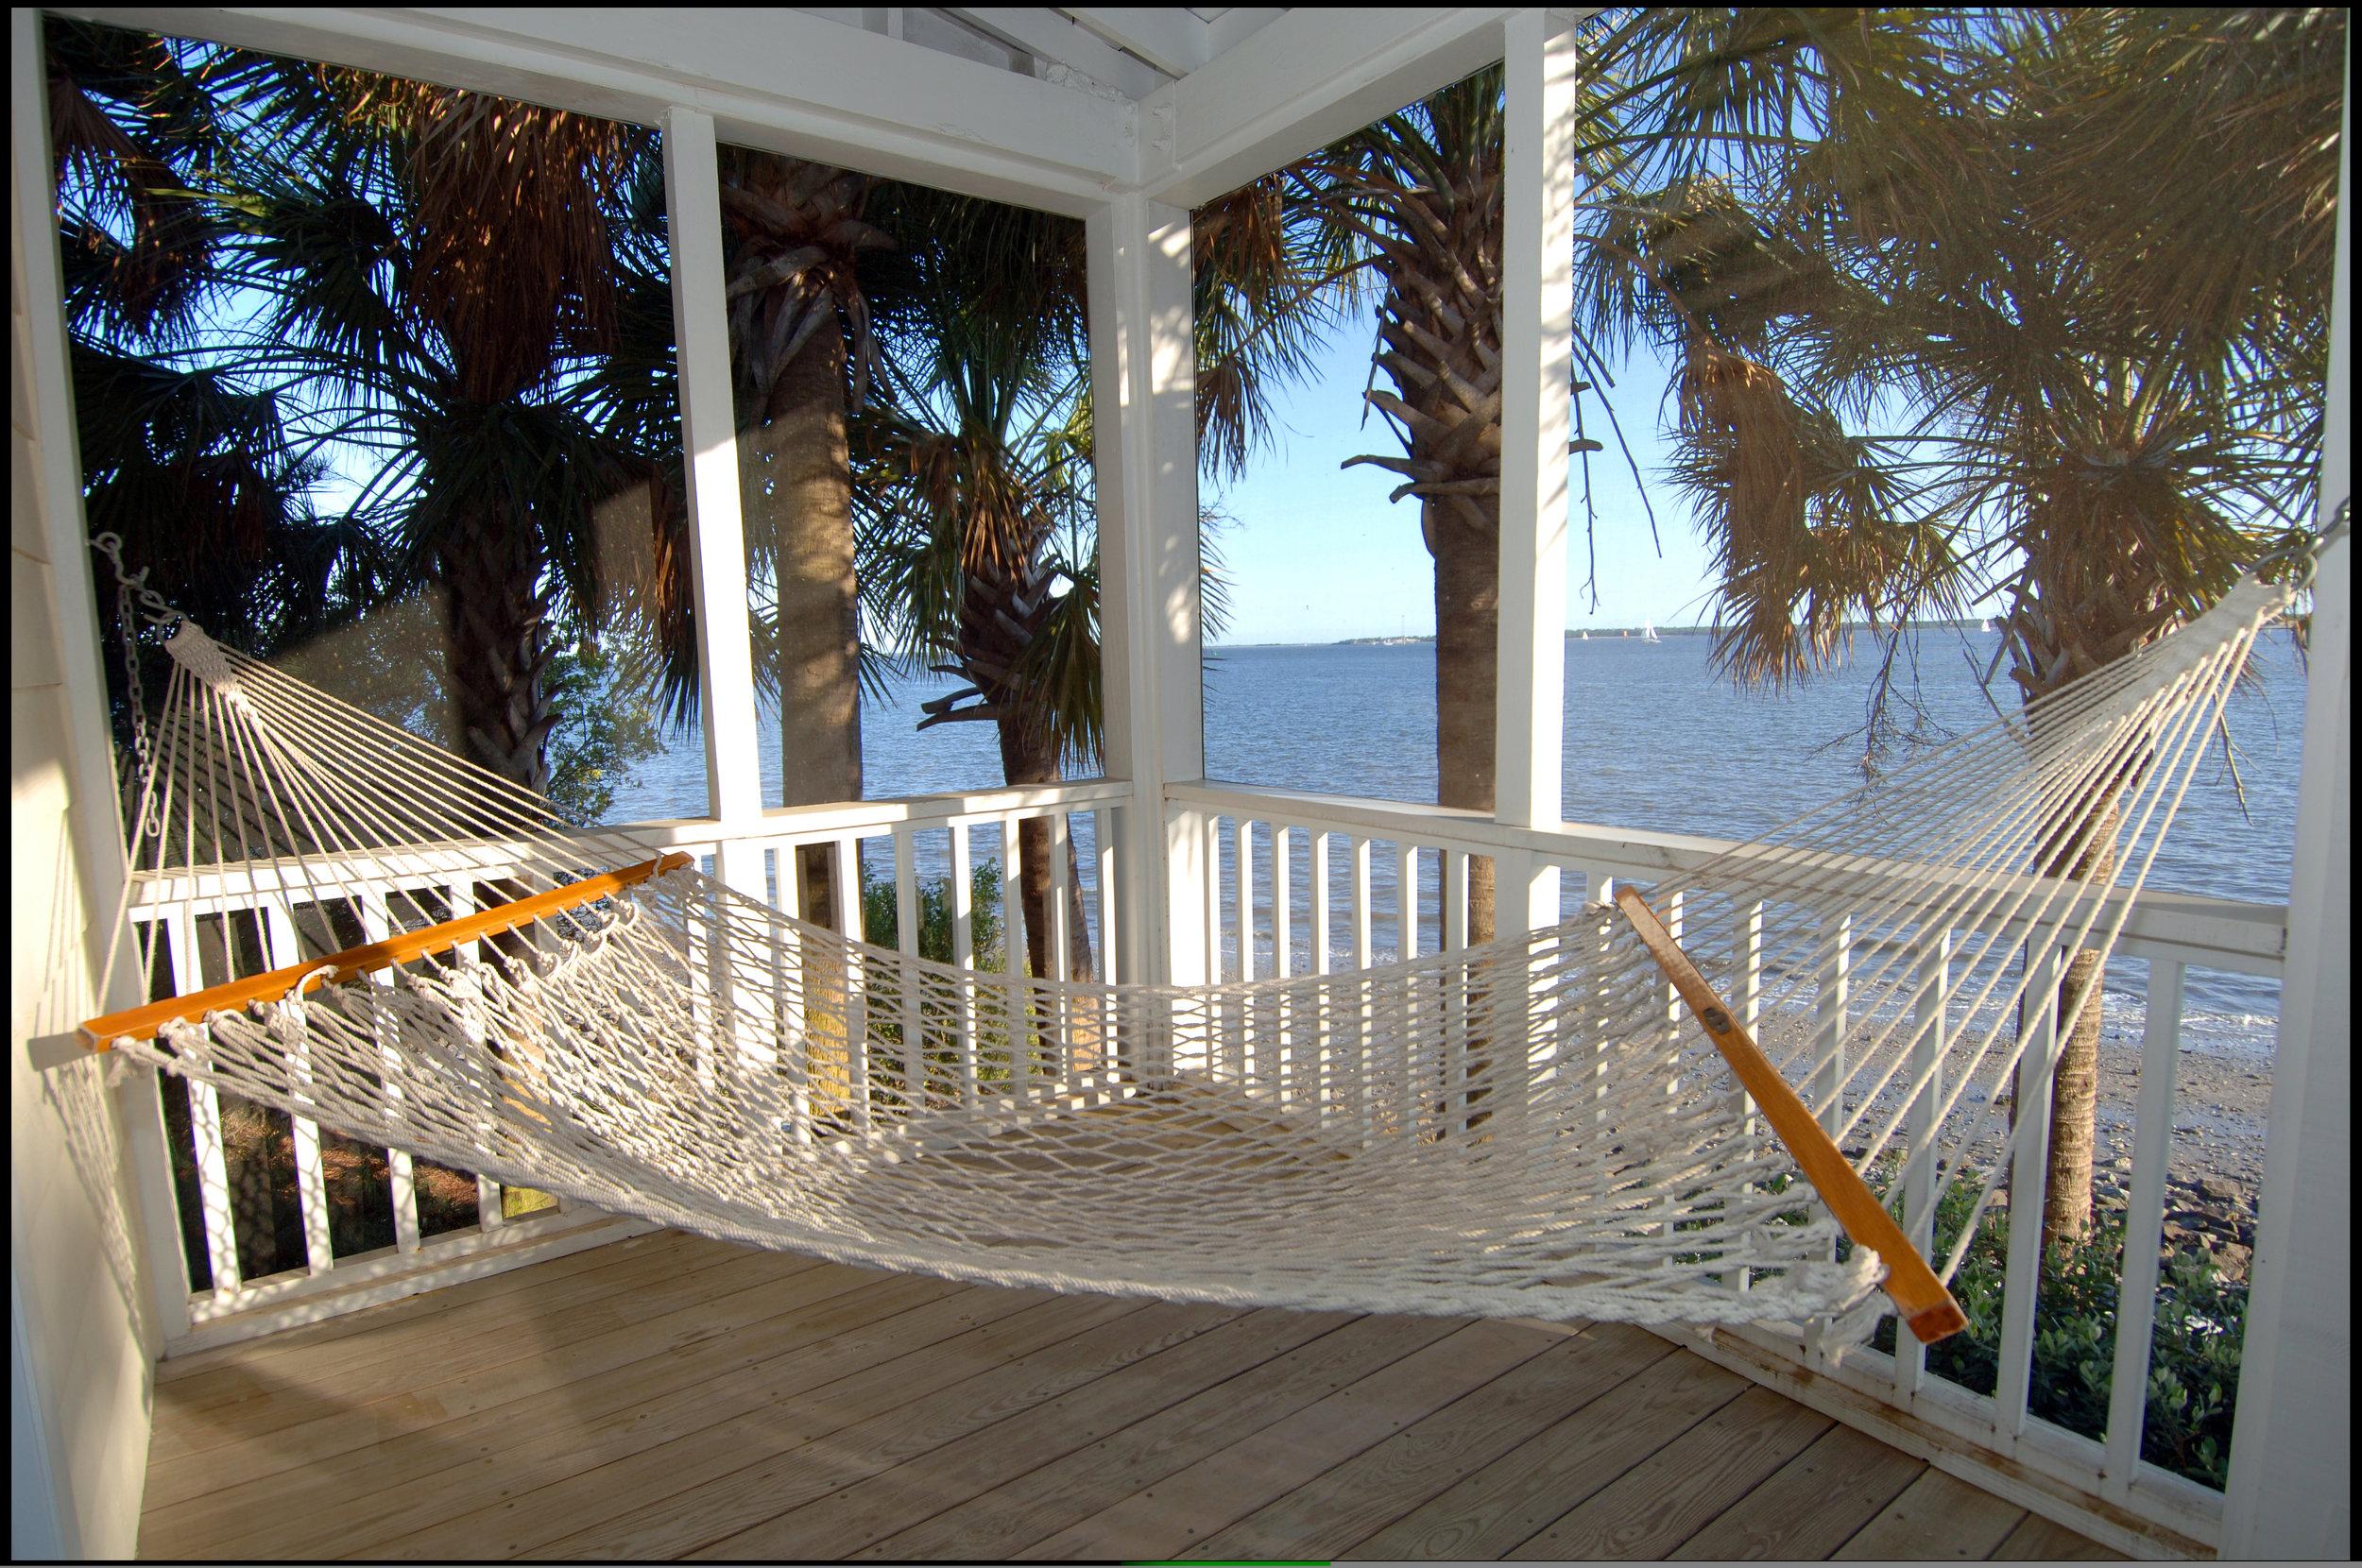 09-private-hammock-large.jpg